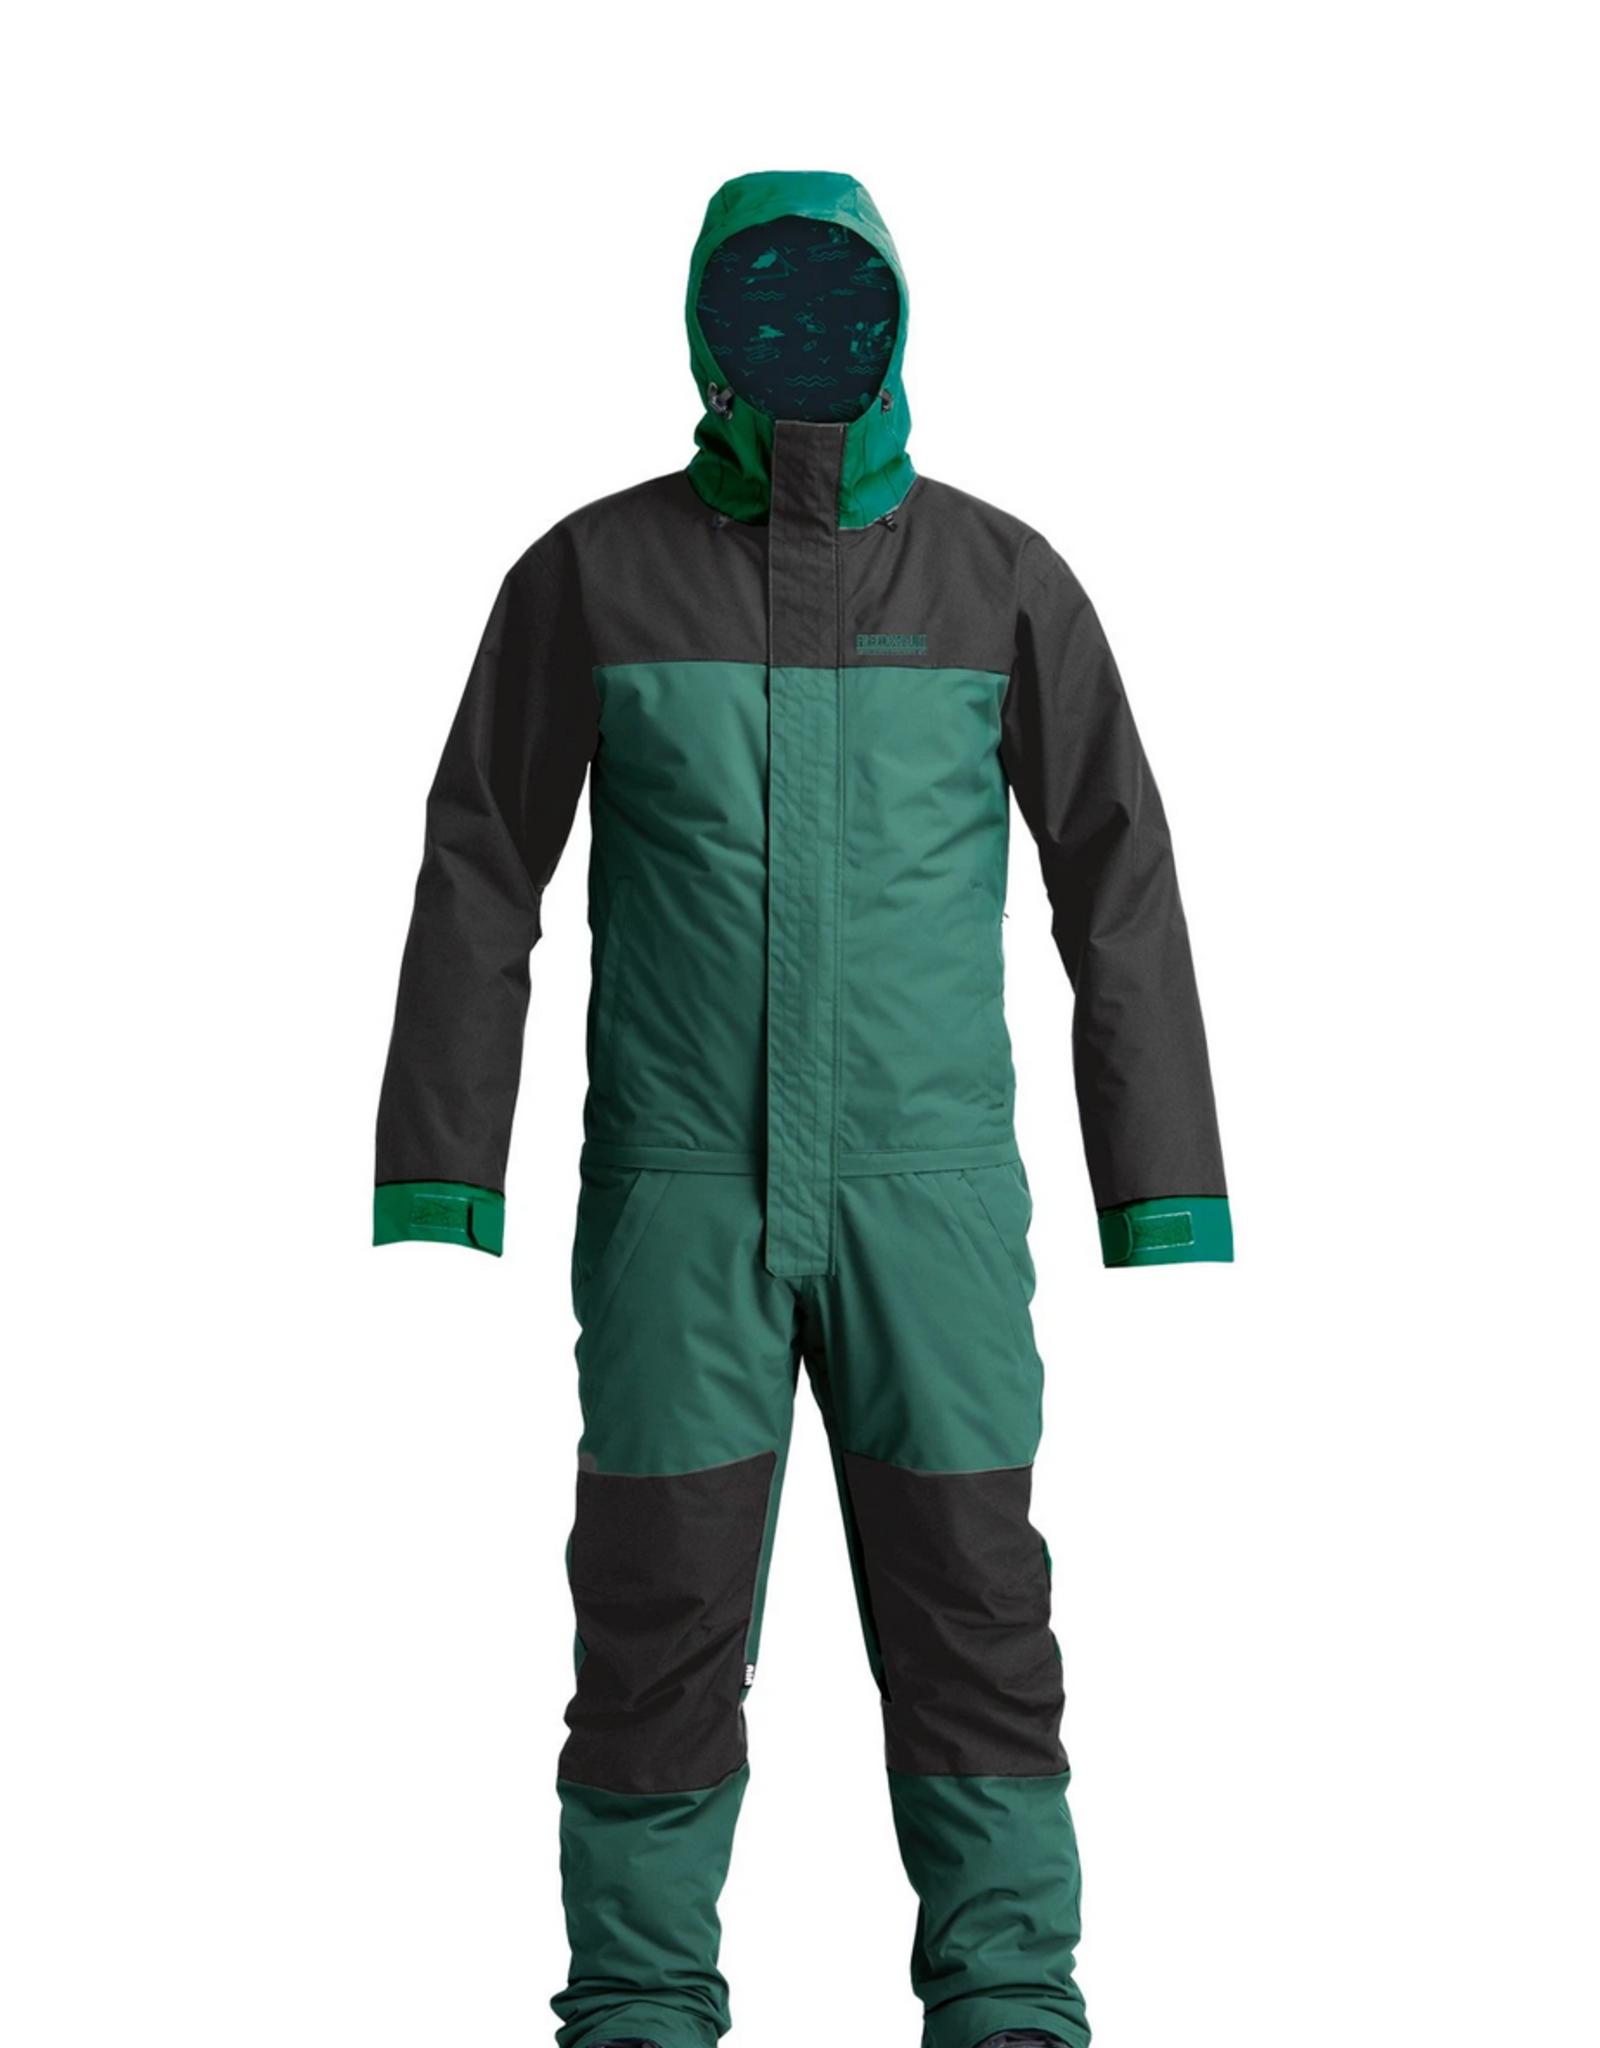 Airblaster Airblaster Insulated Freedom Suit